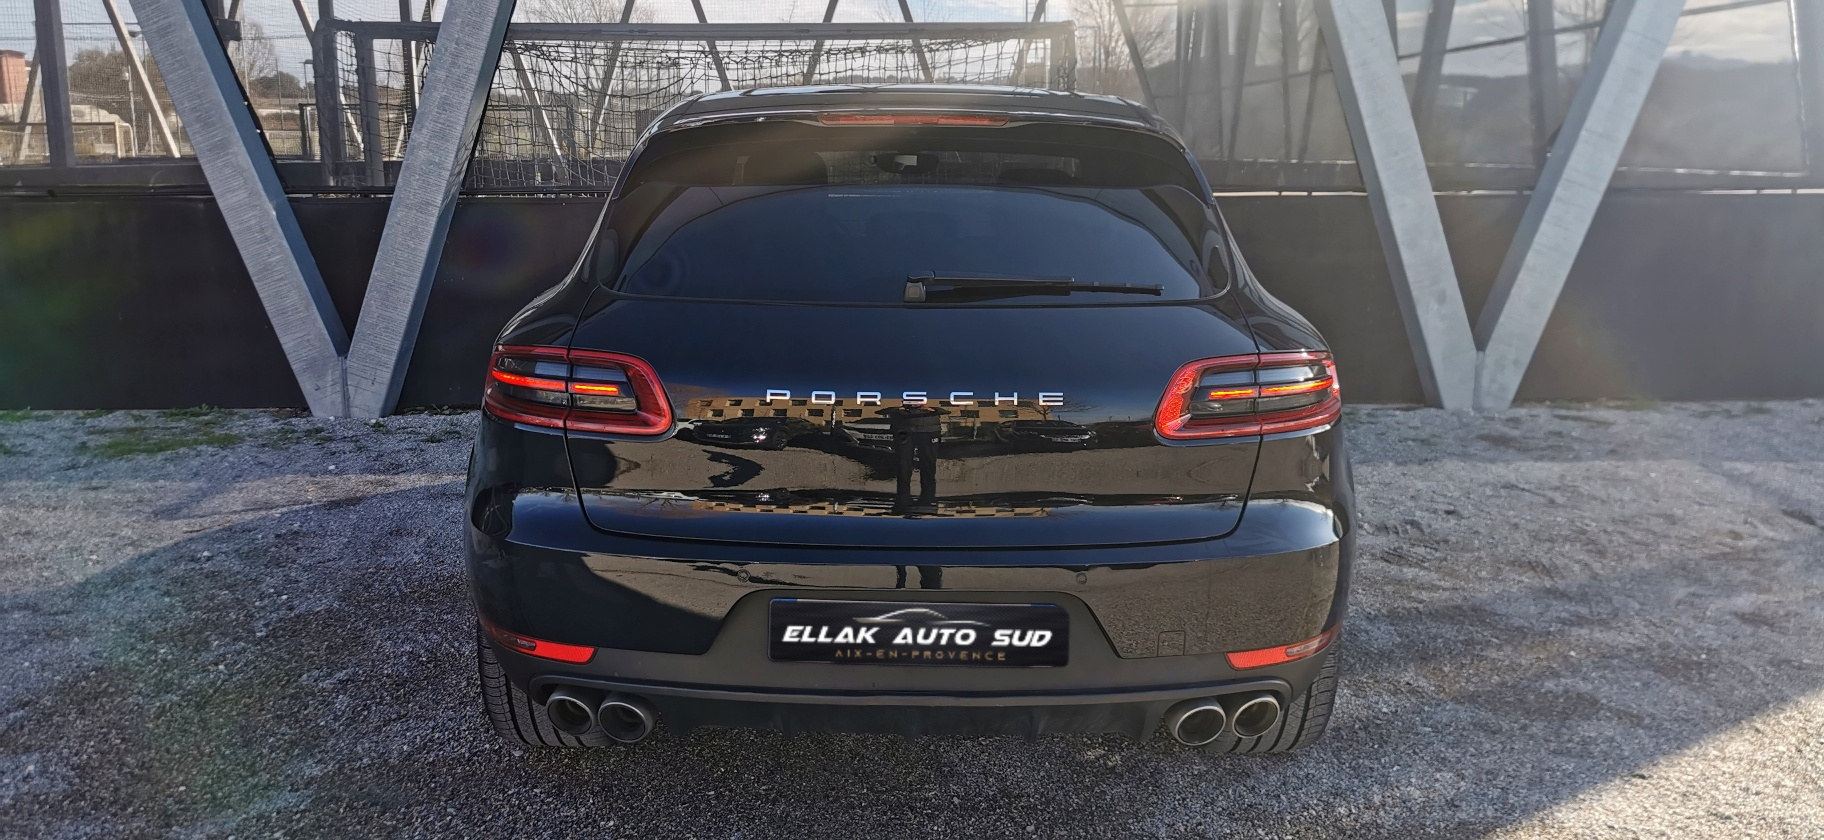 Porsche Macan S - Ellak Auto Sud